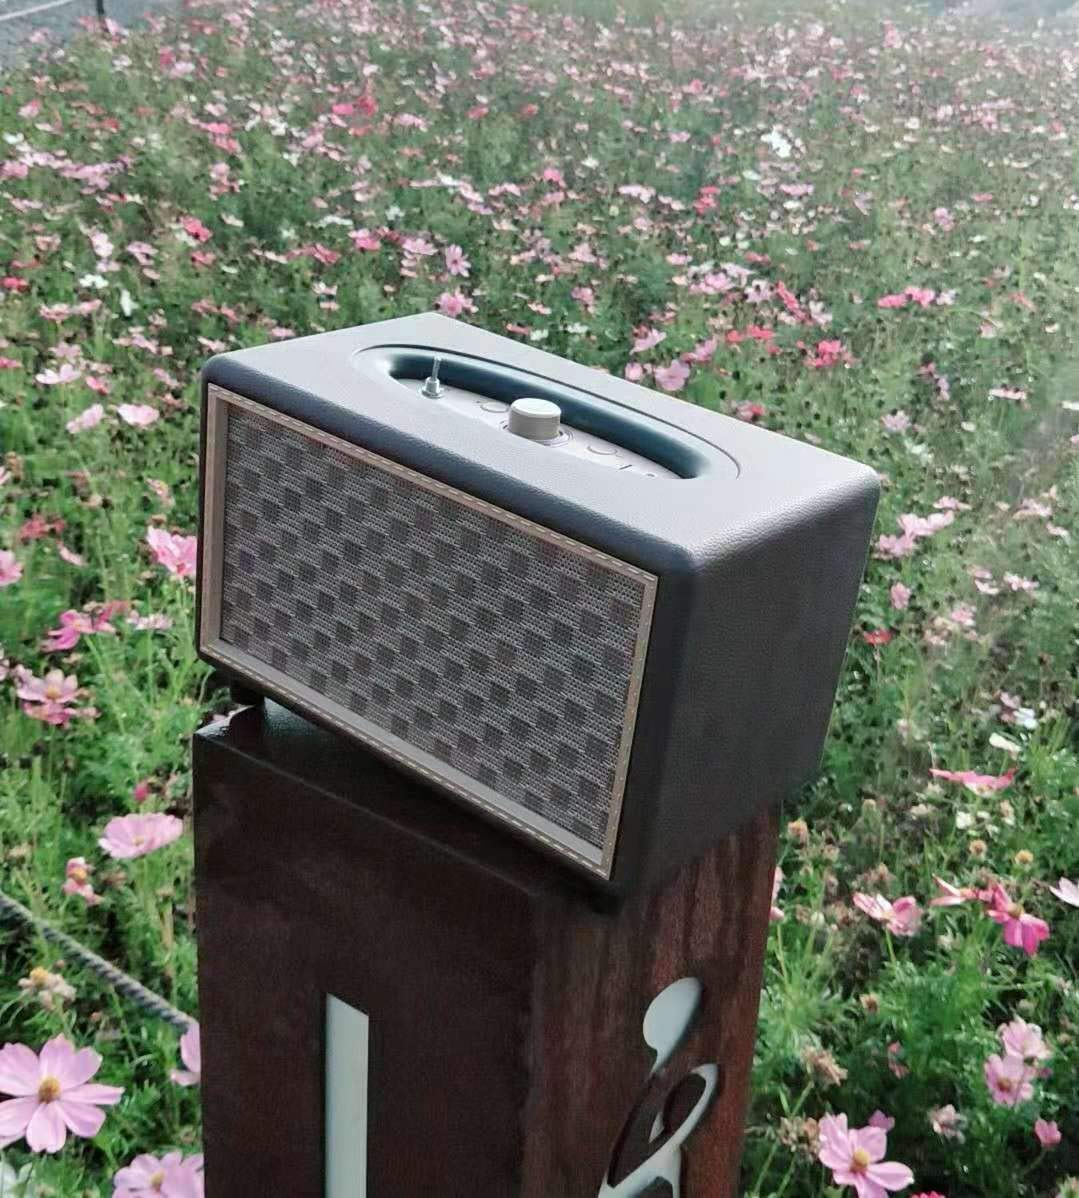 xingganglengyinWireless Card subwoofer Audio 2018 New Creative Wireless Bluetooth Audio by xingganglengyin (Image #4)